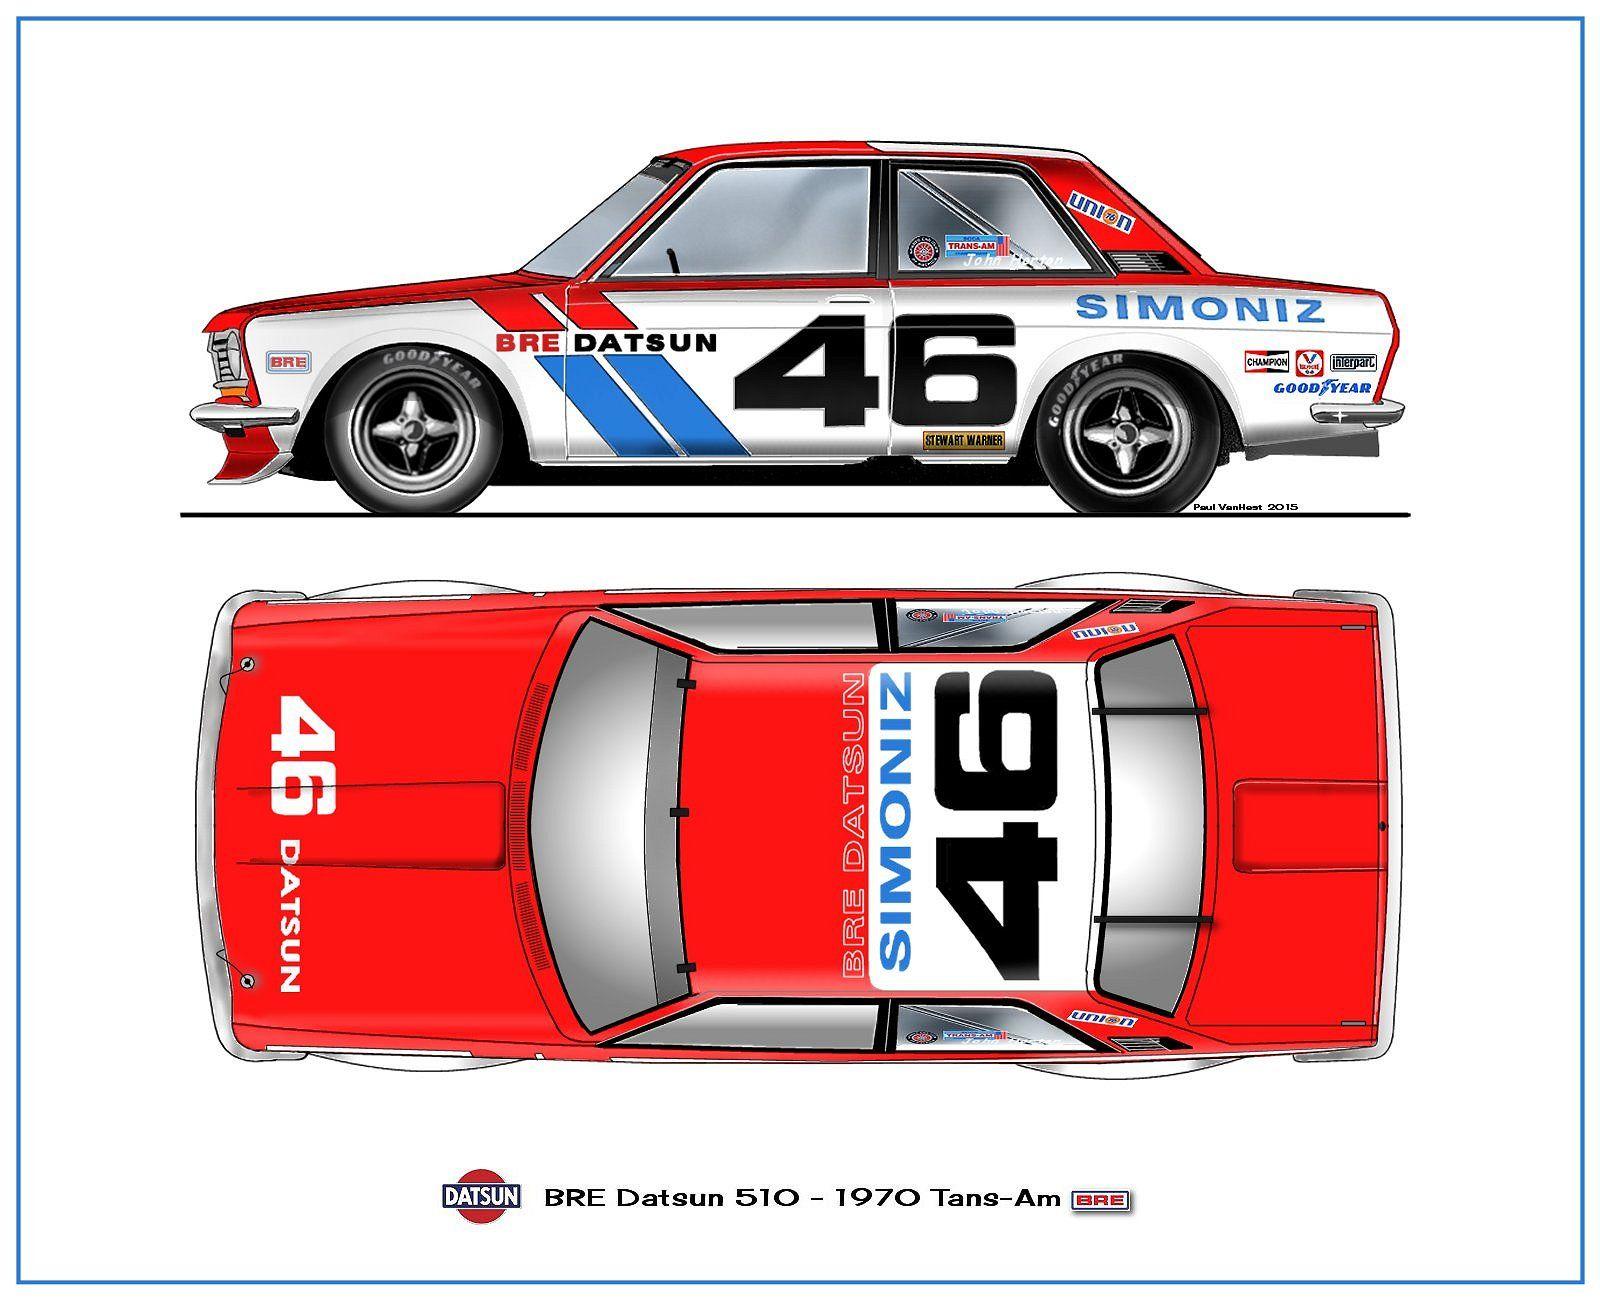 Datsun 510 Datsun Racing Car Design [ 1300 x 1600 Pixel ]